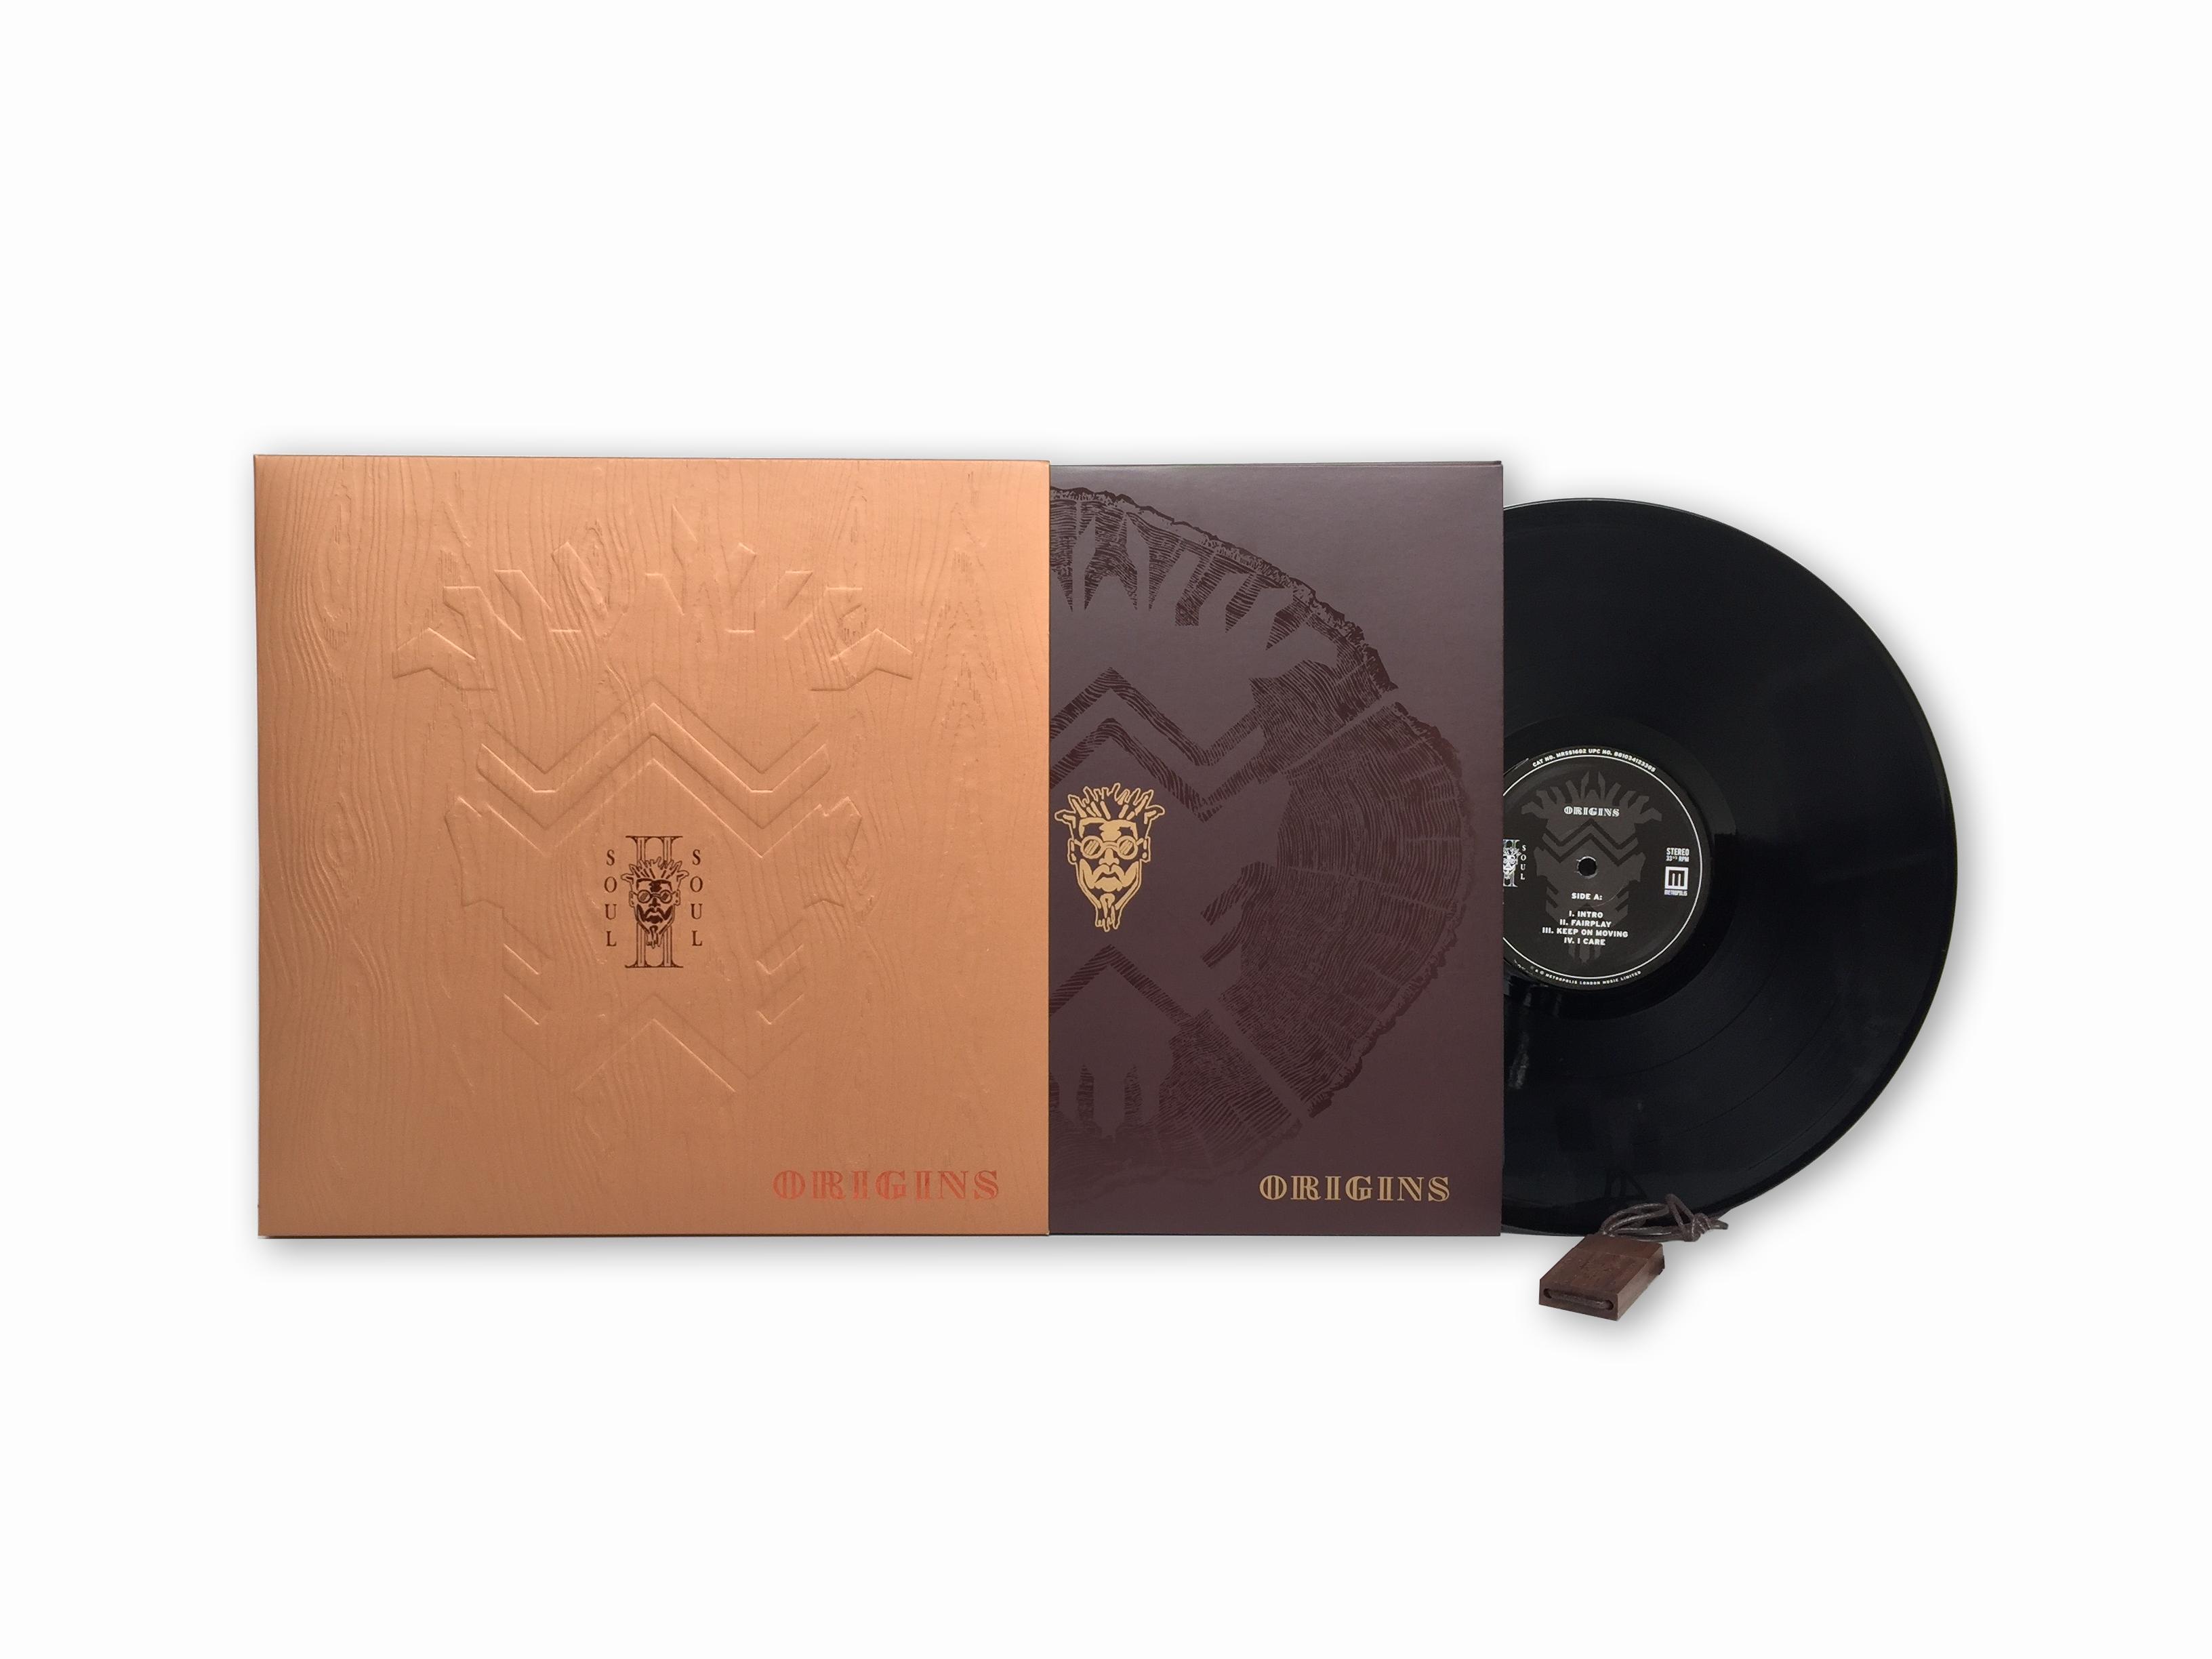 Soul II Soul - Origins - Deluxe Vinyl Box set